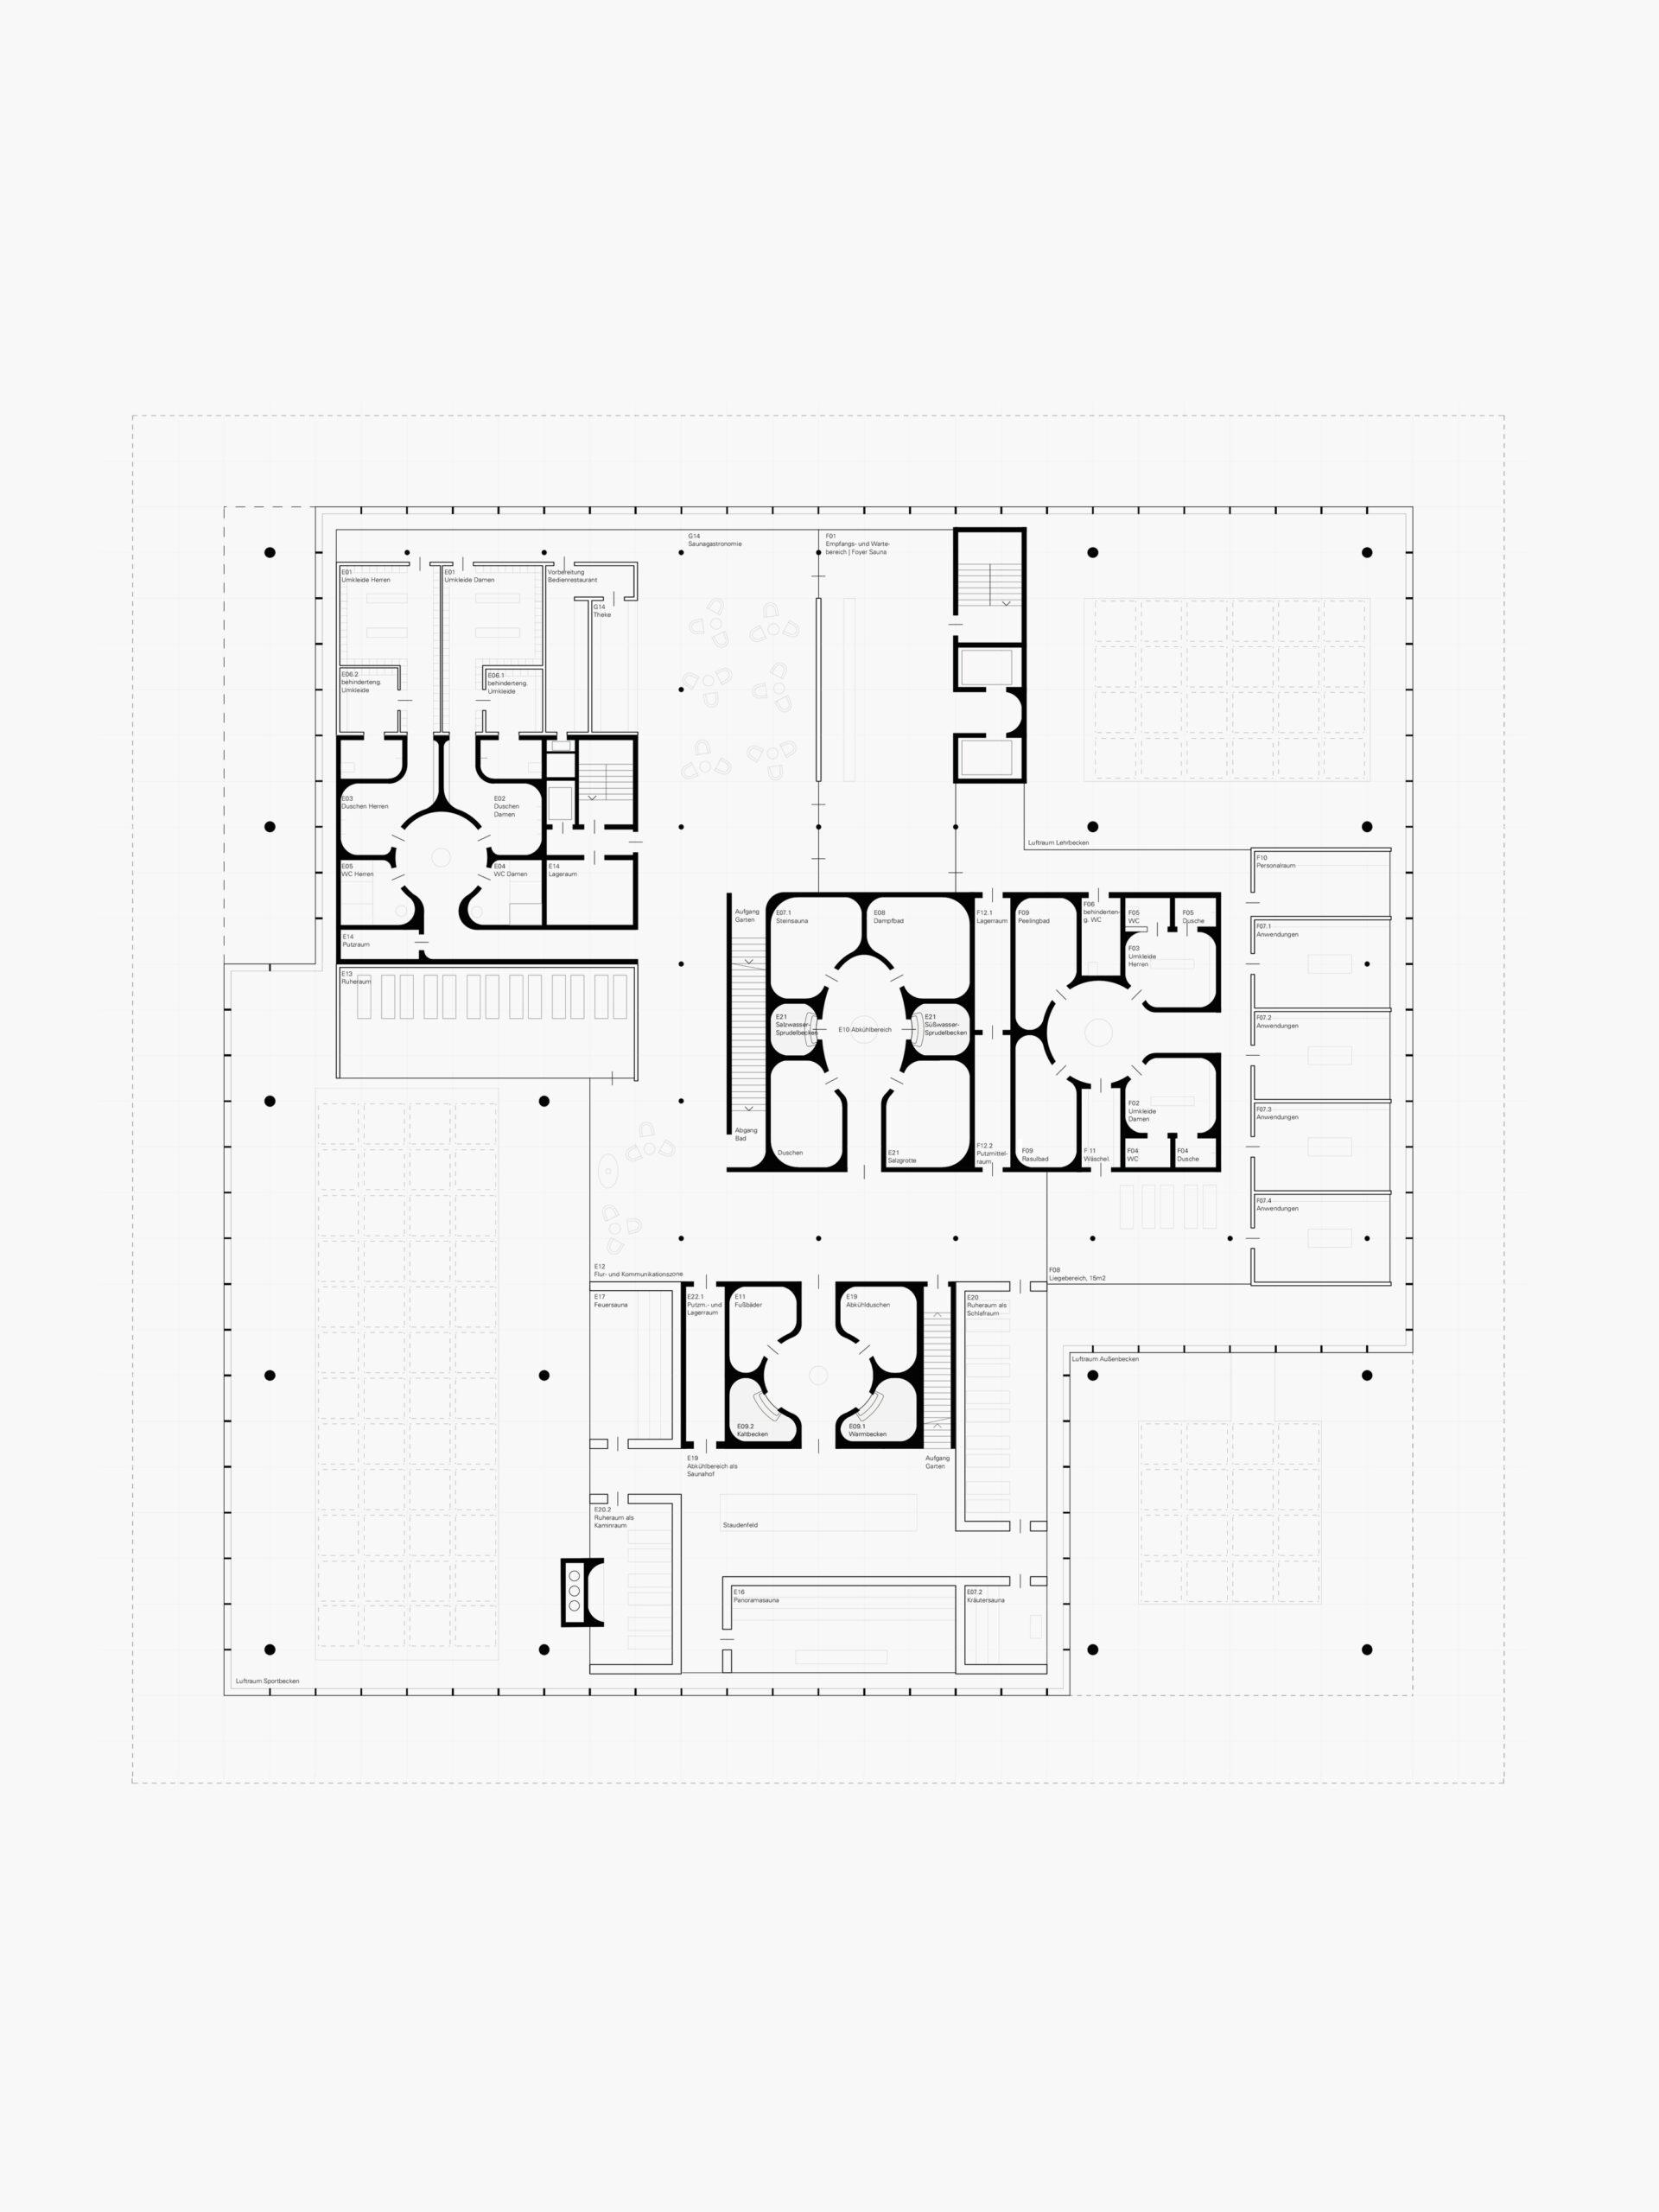 Michael-Becker-Architects-Architekten-Therme-Oberstdorf-Grundriss-OG